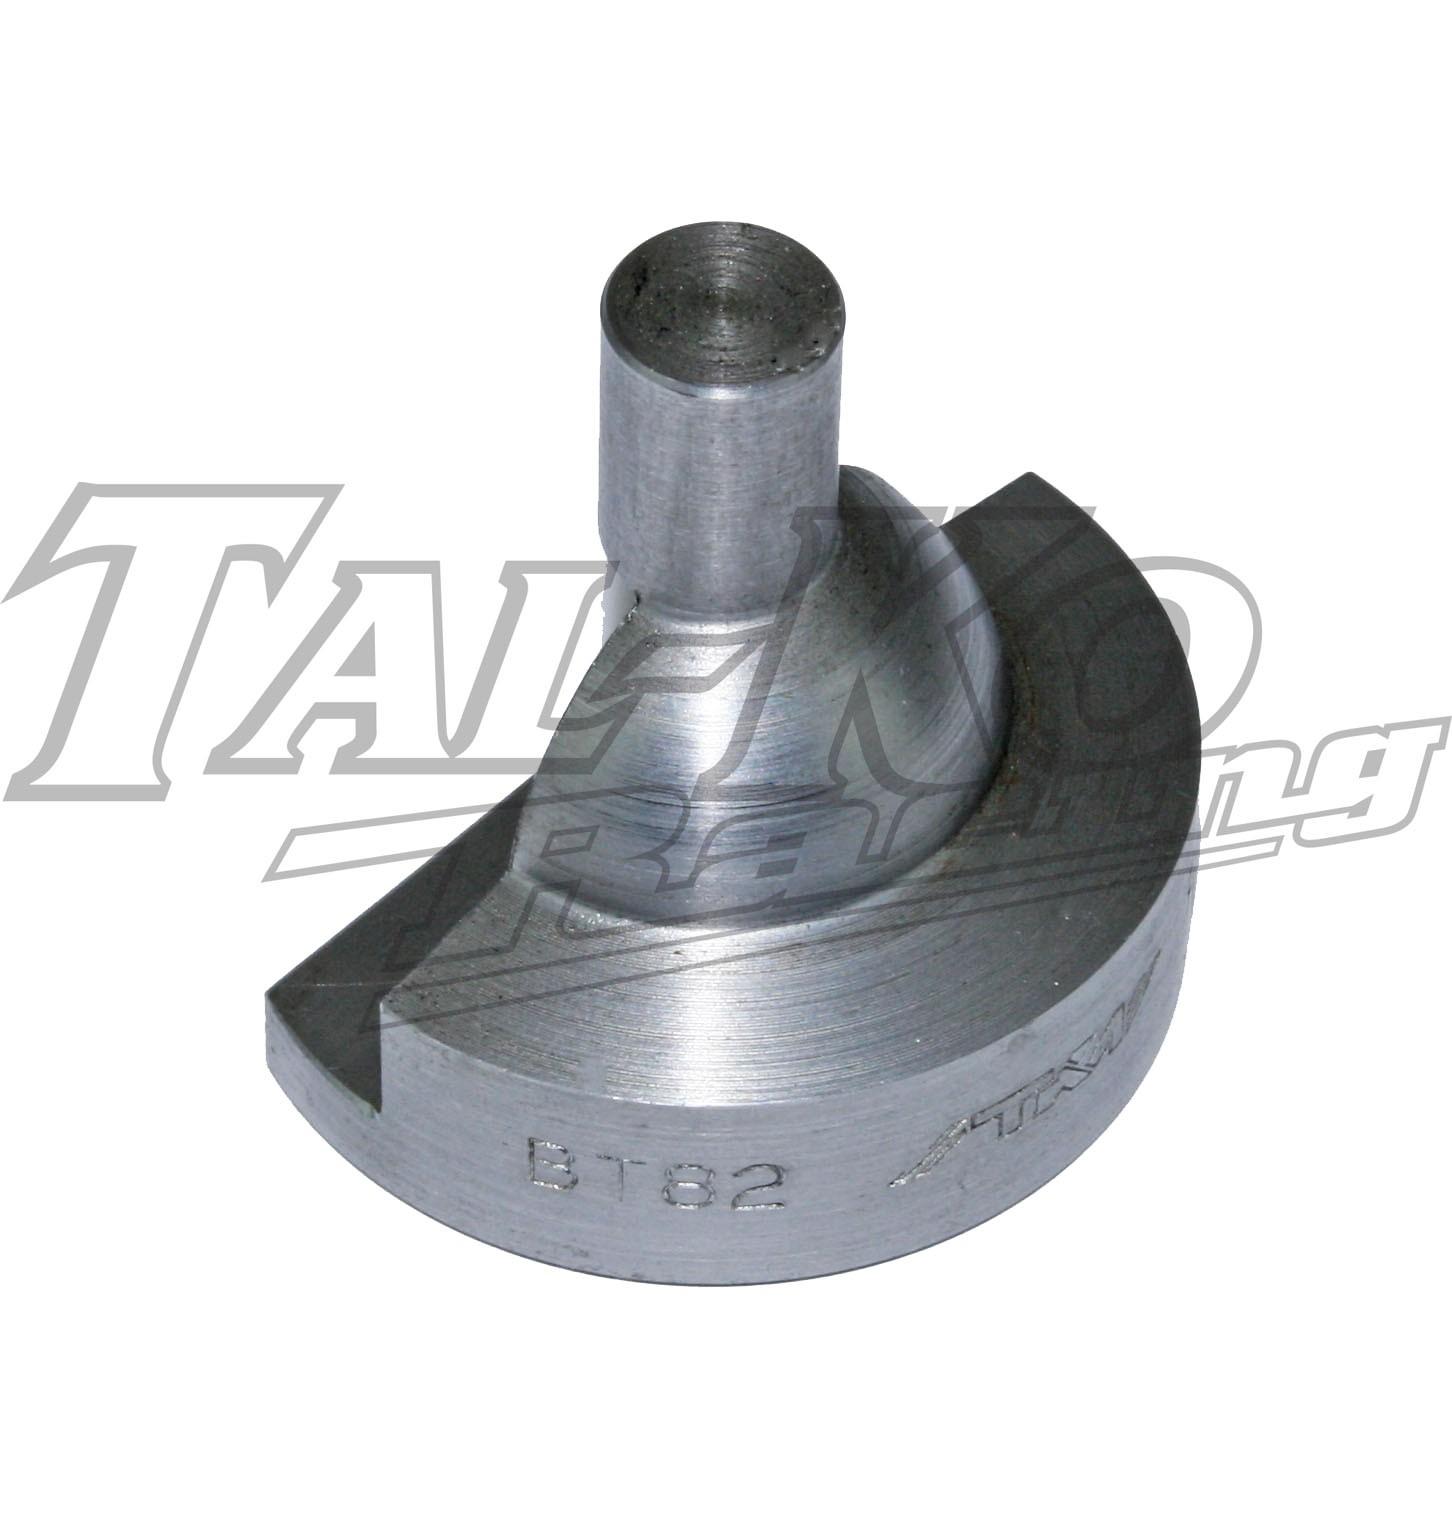 TKM BT82 FICHE HEAD GAUGE 11 DEGREES 100cc